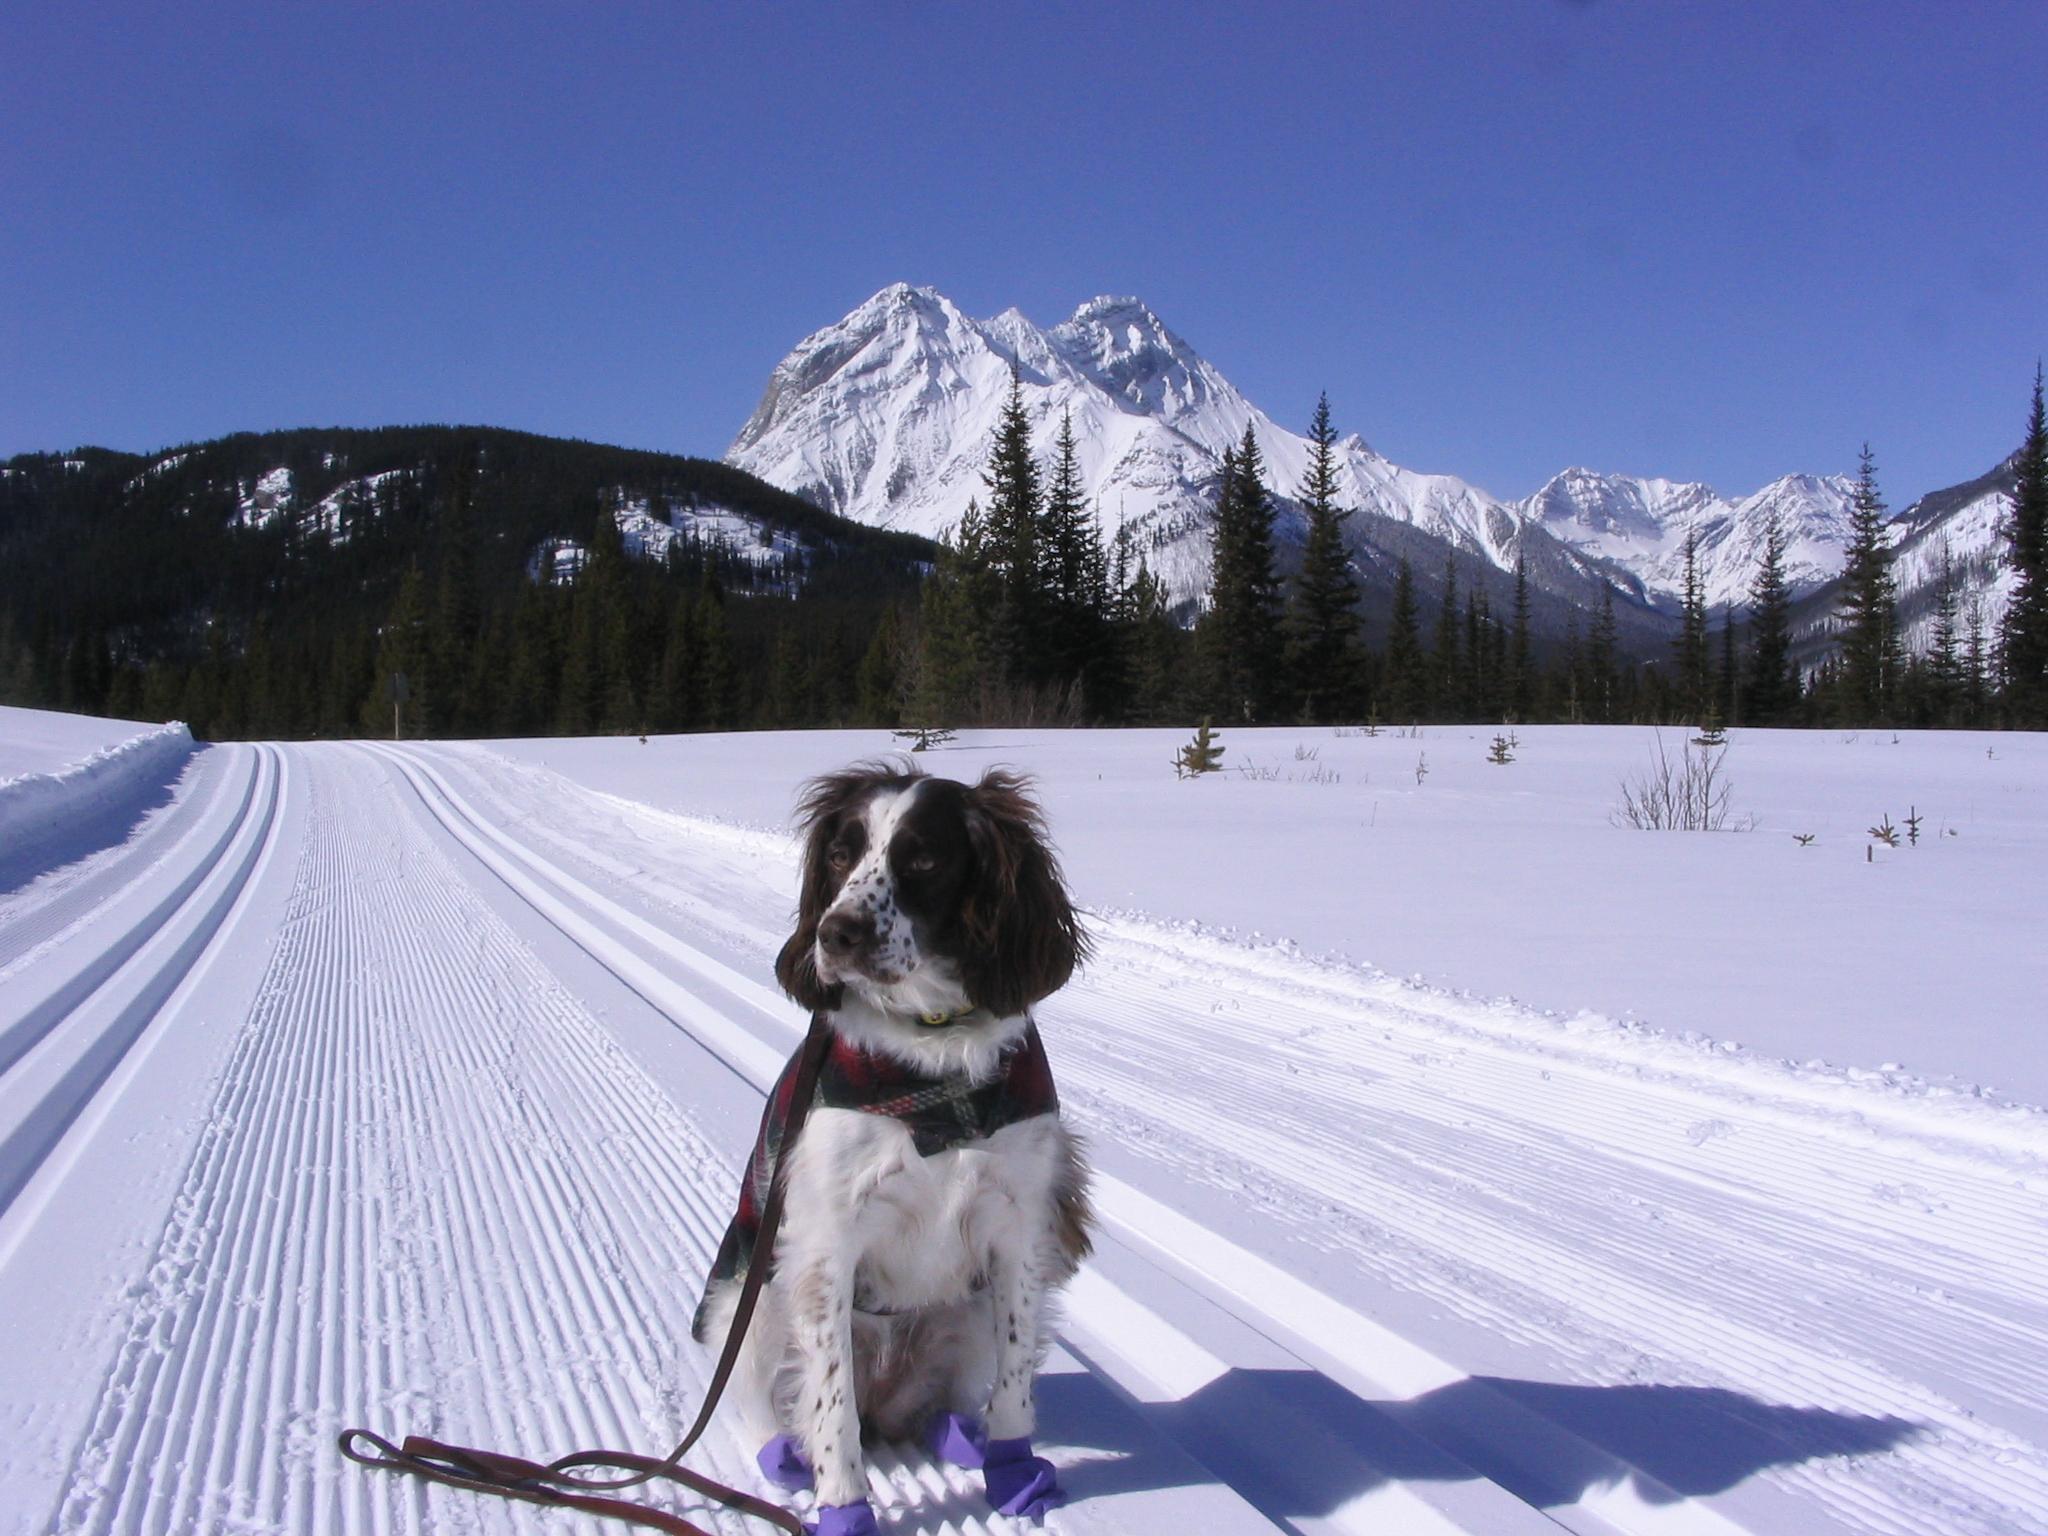 Tessa - ready to ski at Mt Shark Mar 11, 2009